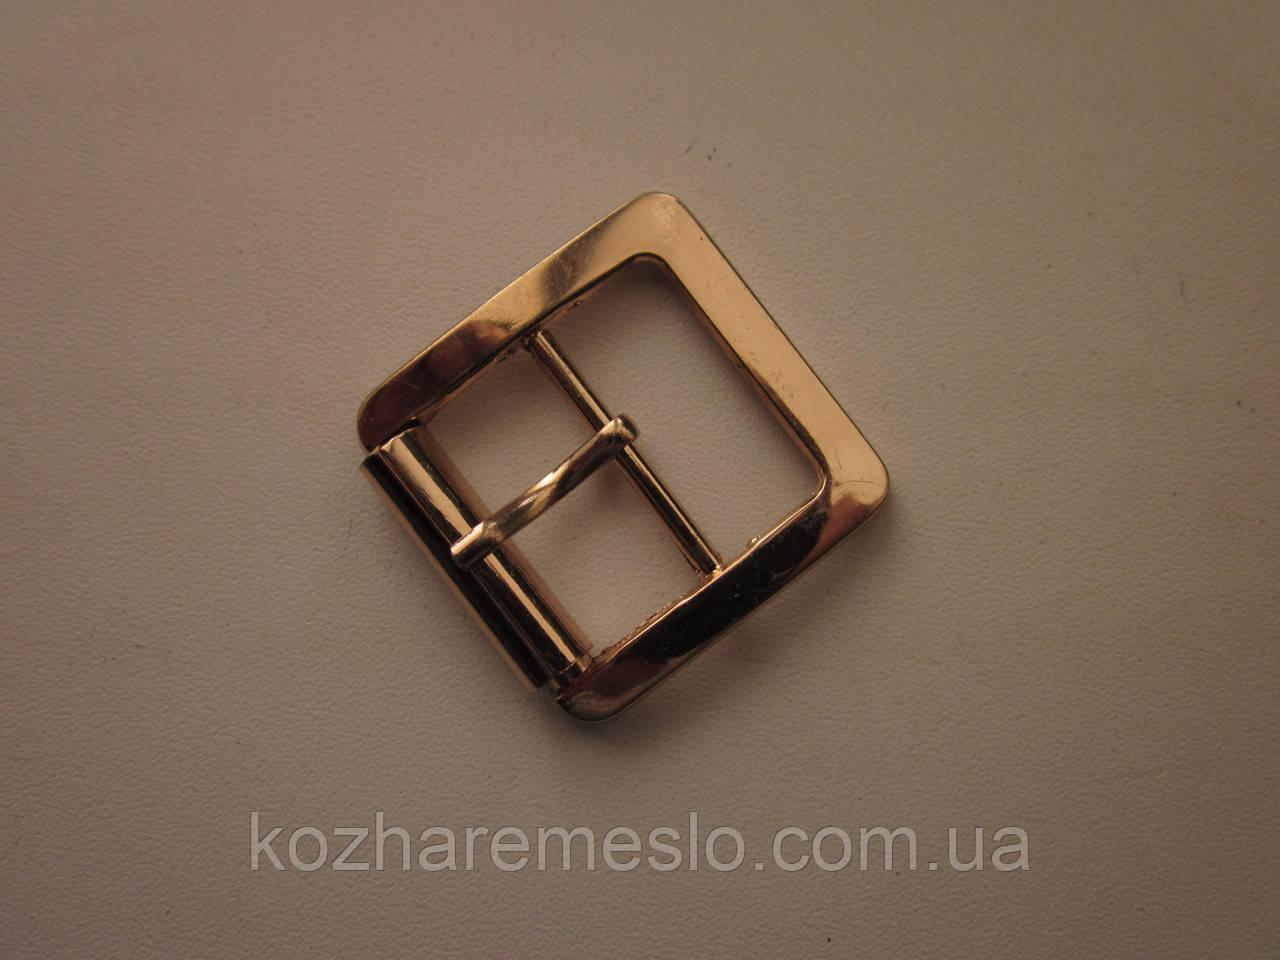 Пряжка для сумки 25 мм золото Б\У